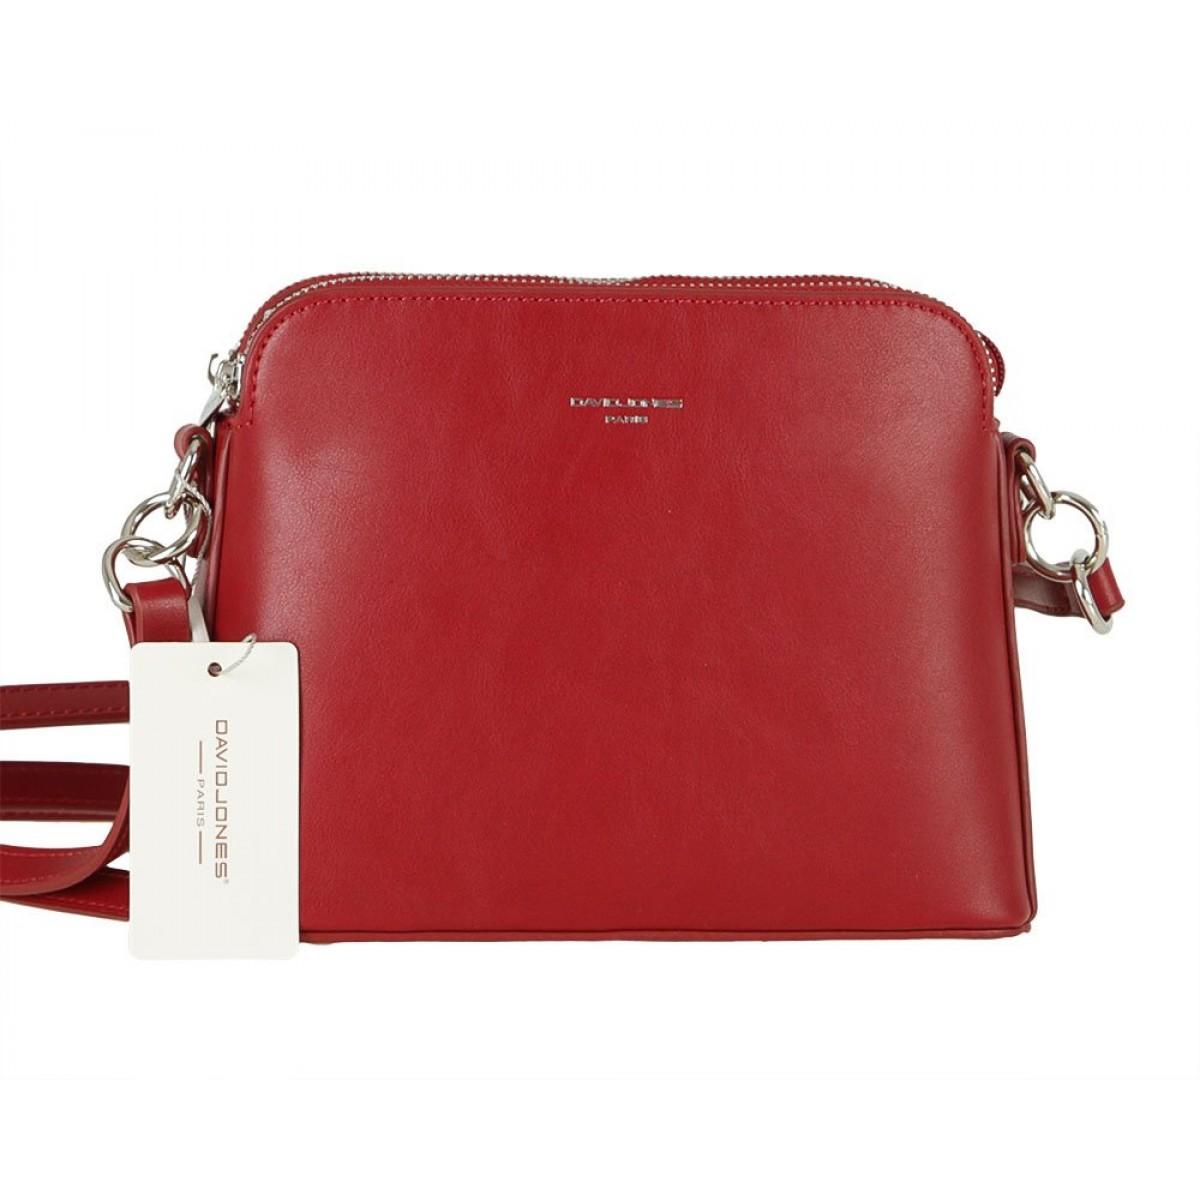 Жіноча сумка David Jones 6407-1 DARK RED